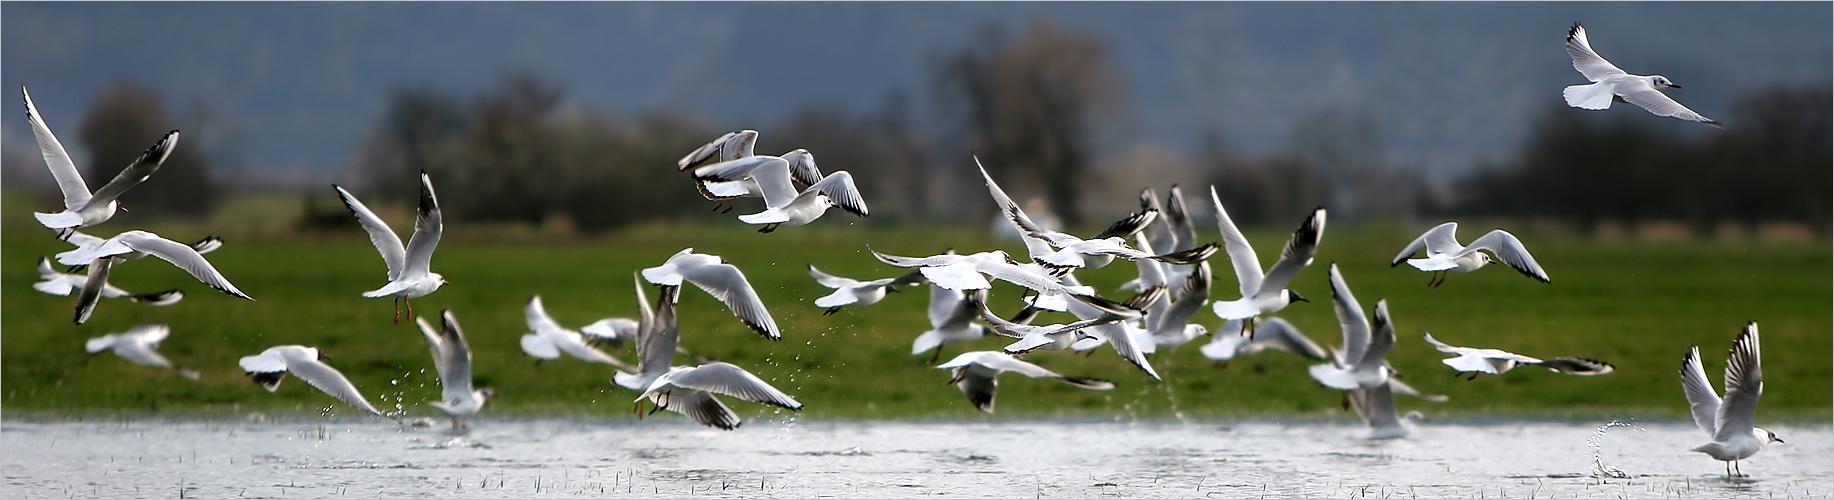 Chaotenvögel